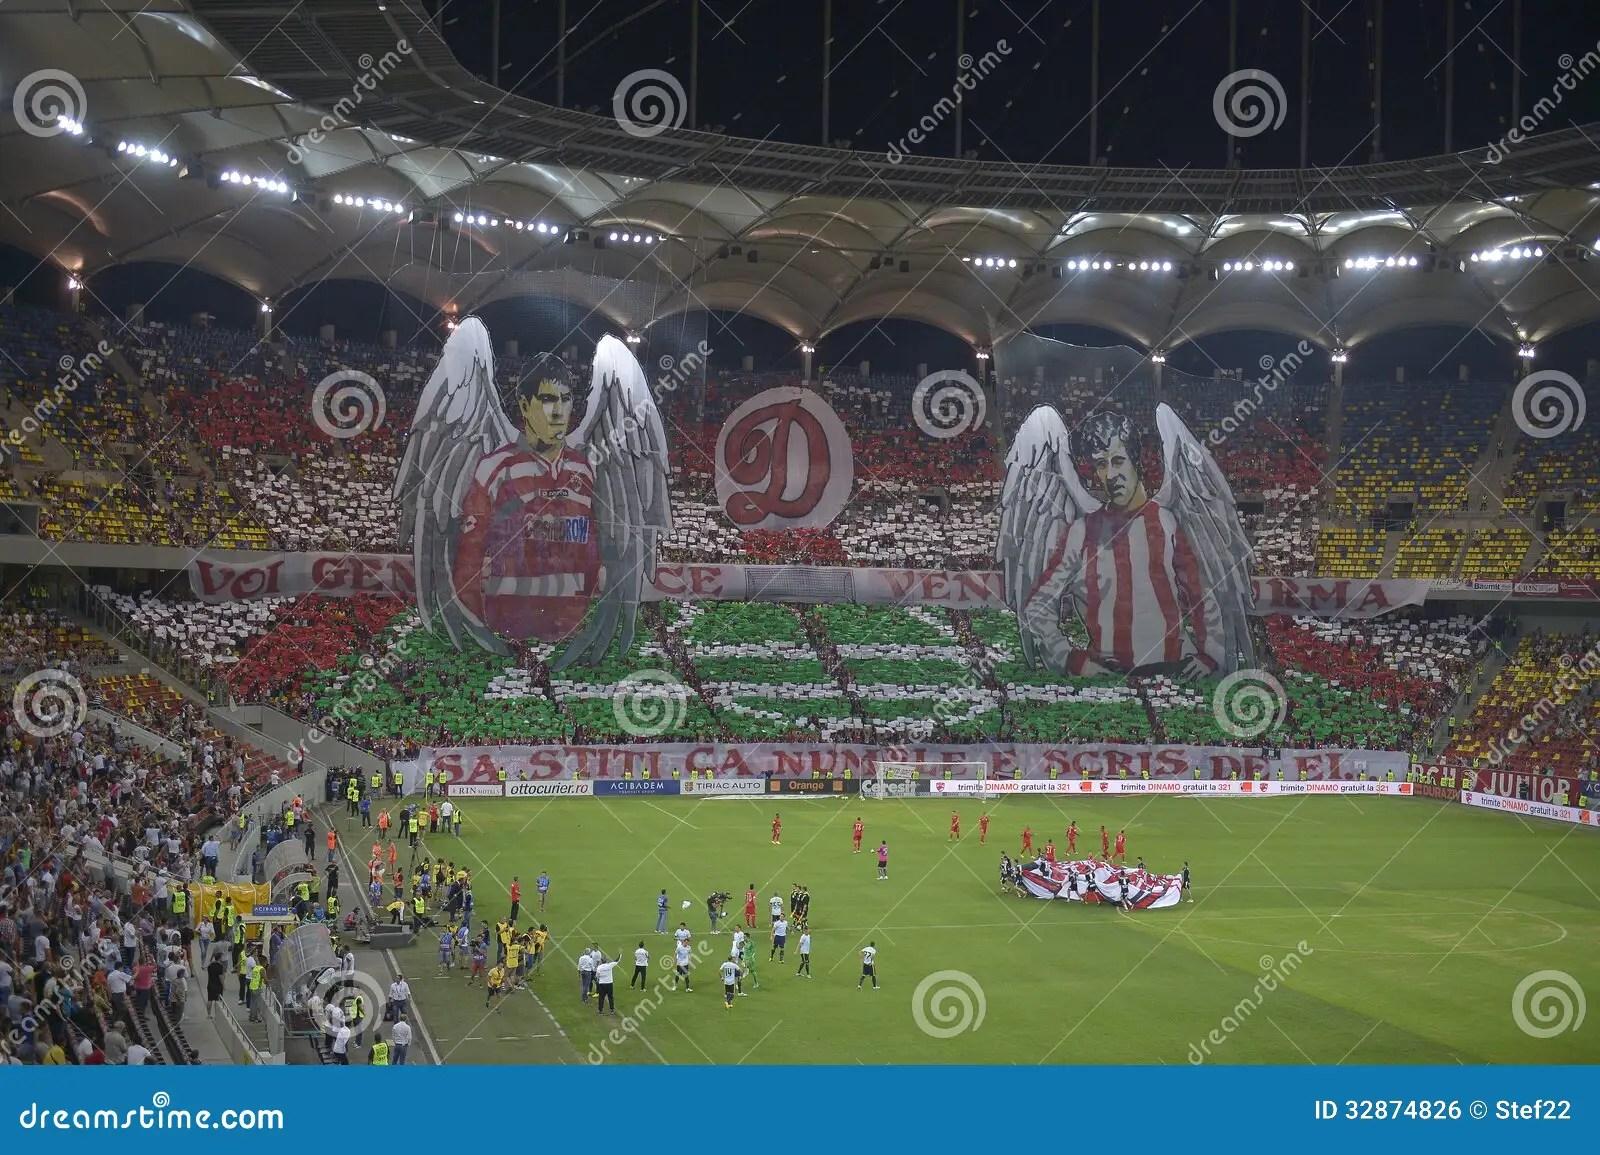 Arsenal Wallpaper 3d Dinamo Steaua 3d Choreography Editorial Photo Image